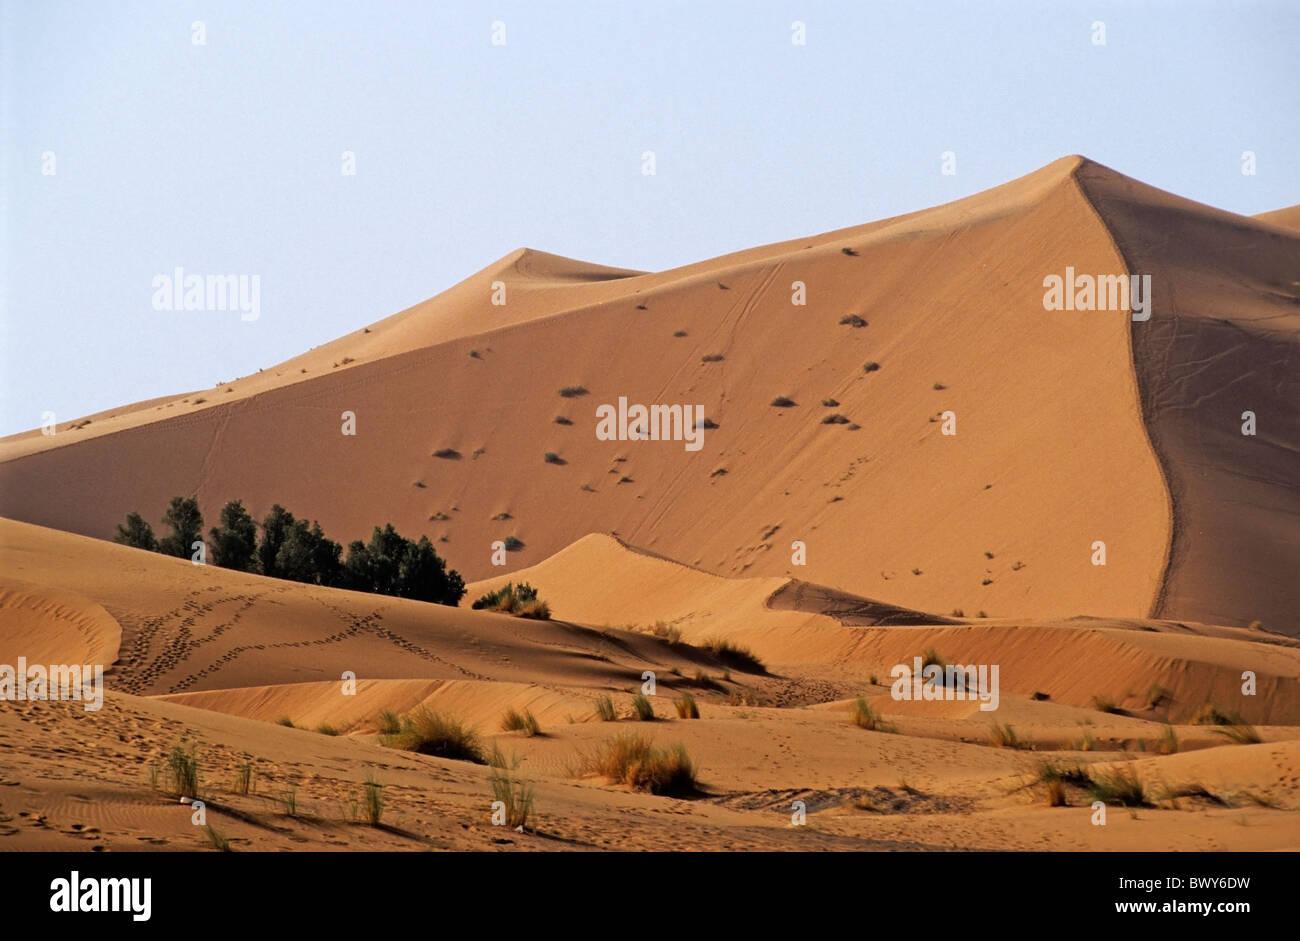 The Great Merzouga Dune in the Sahara desert, Erg Chebbi, Morocco. - Stock Image